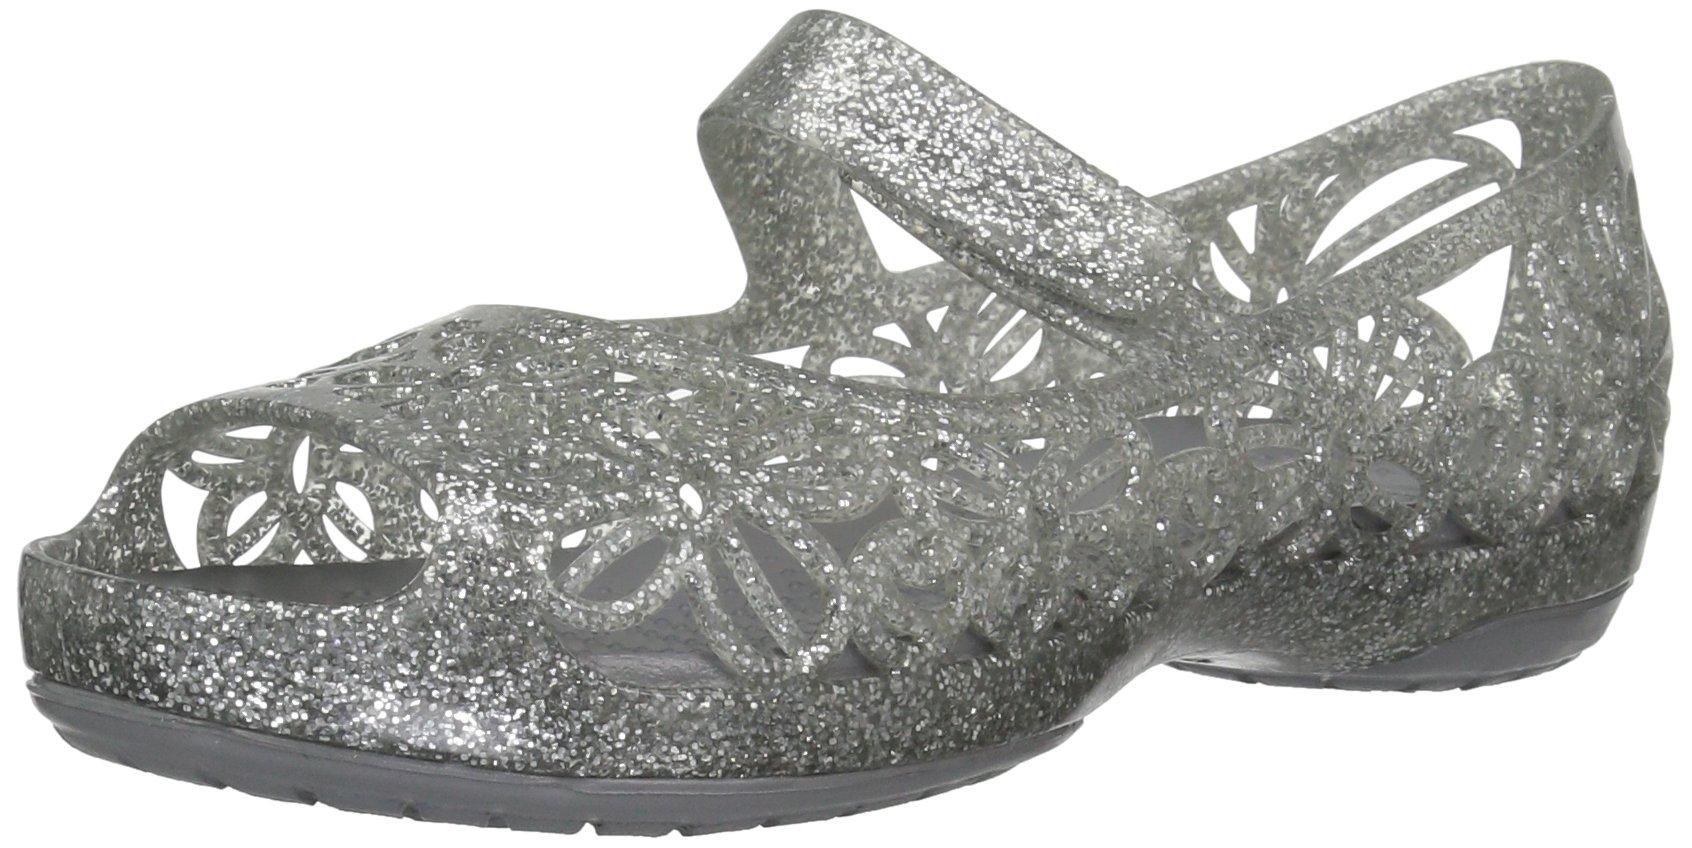 Crocs Girls' Isabella Glitter PS Ballet Flat, Silver, 6 M US Toddler